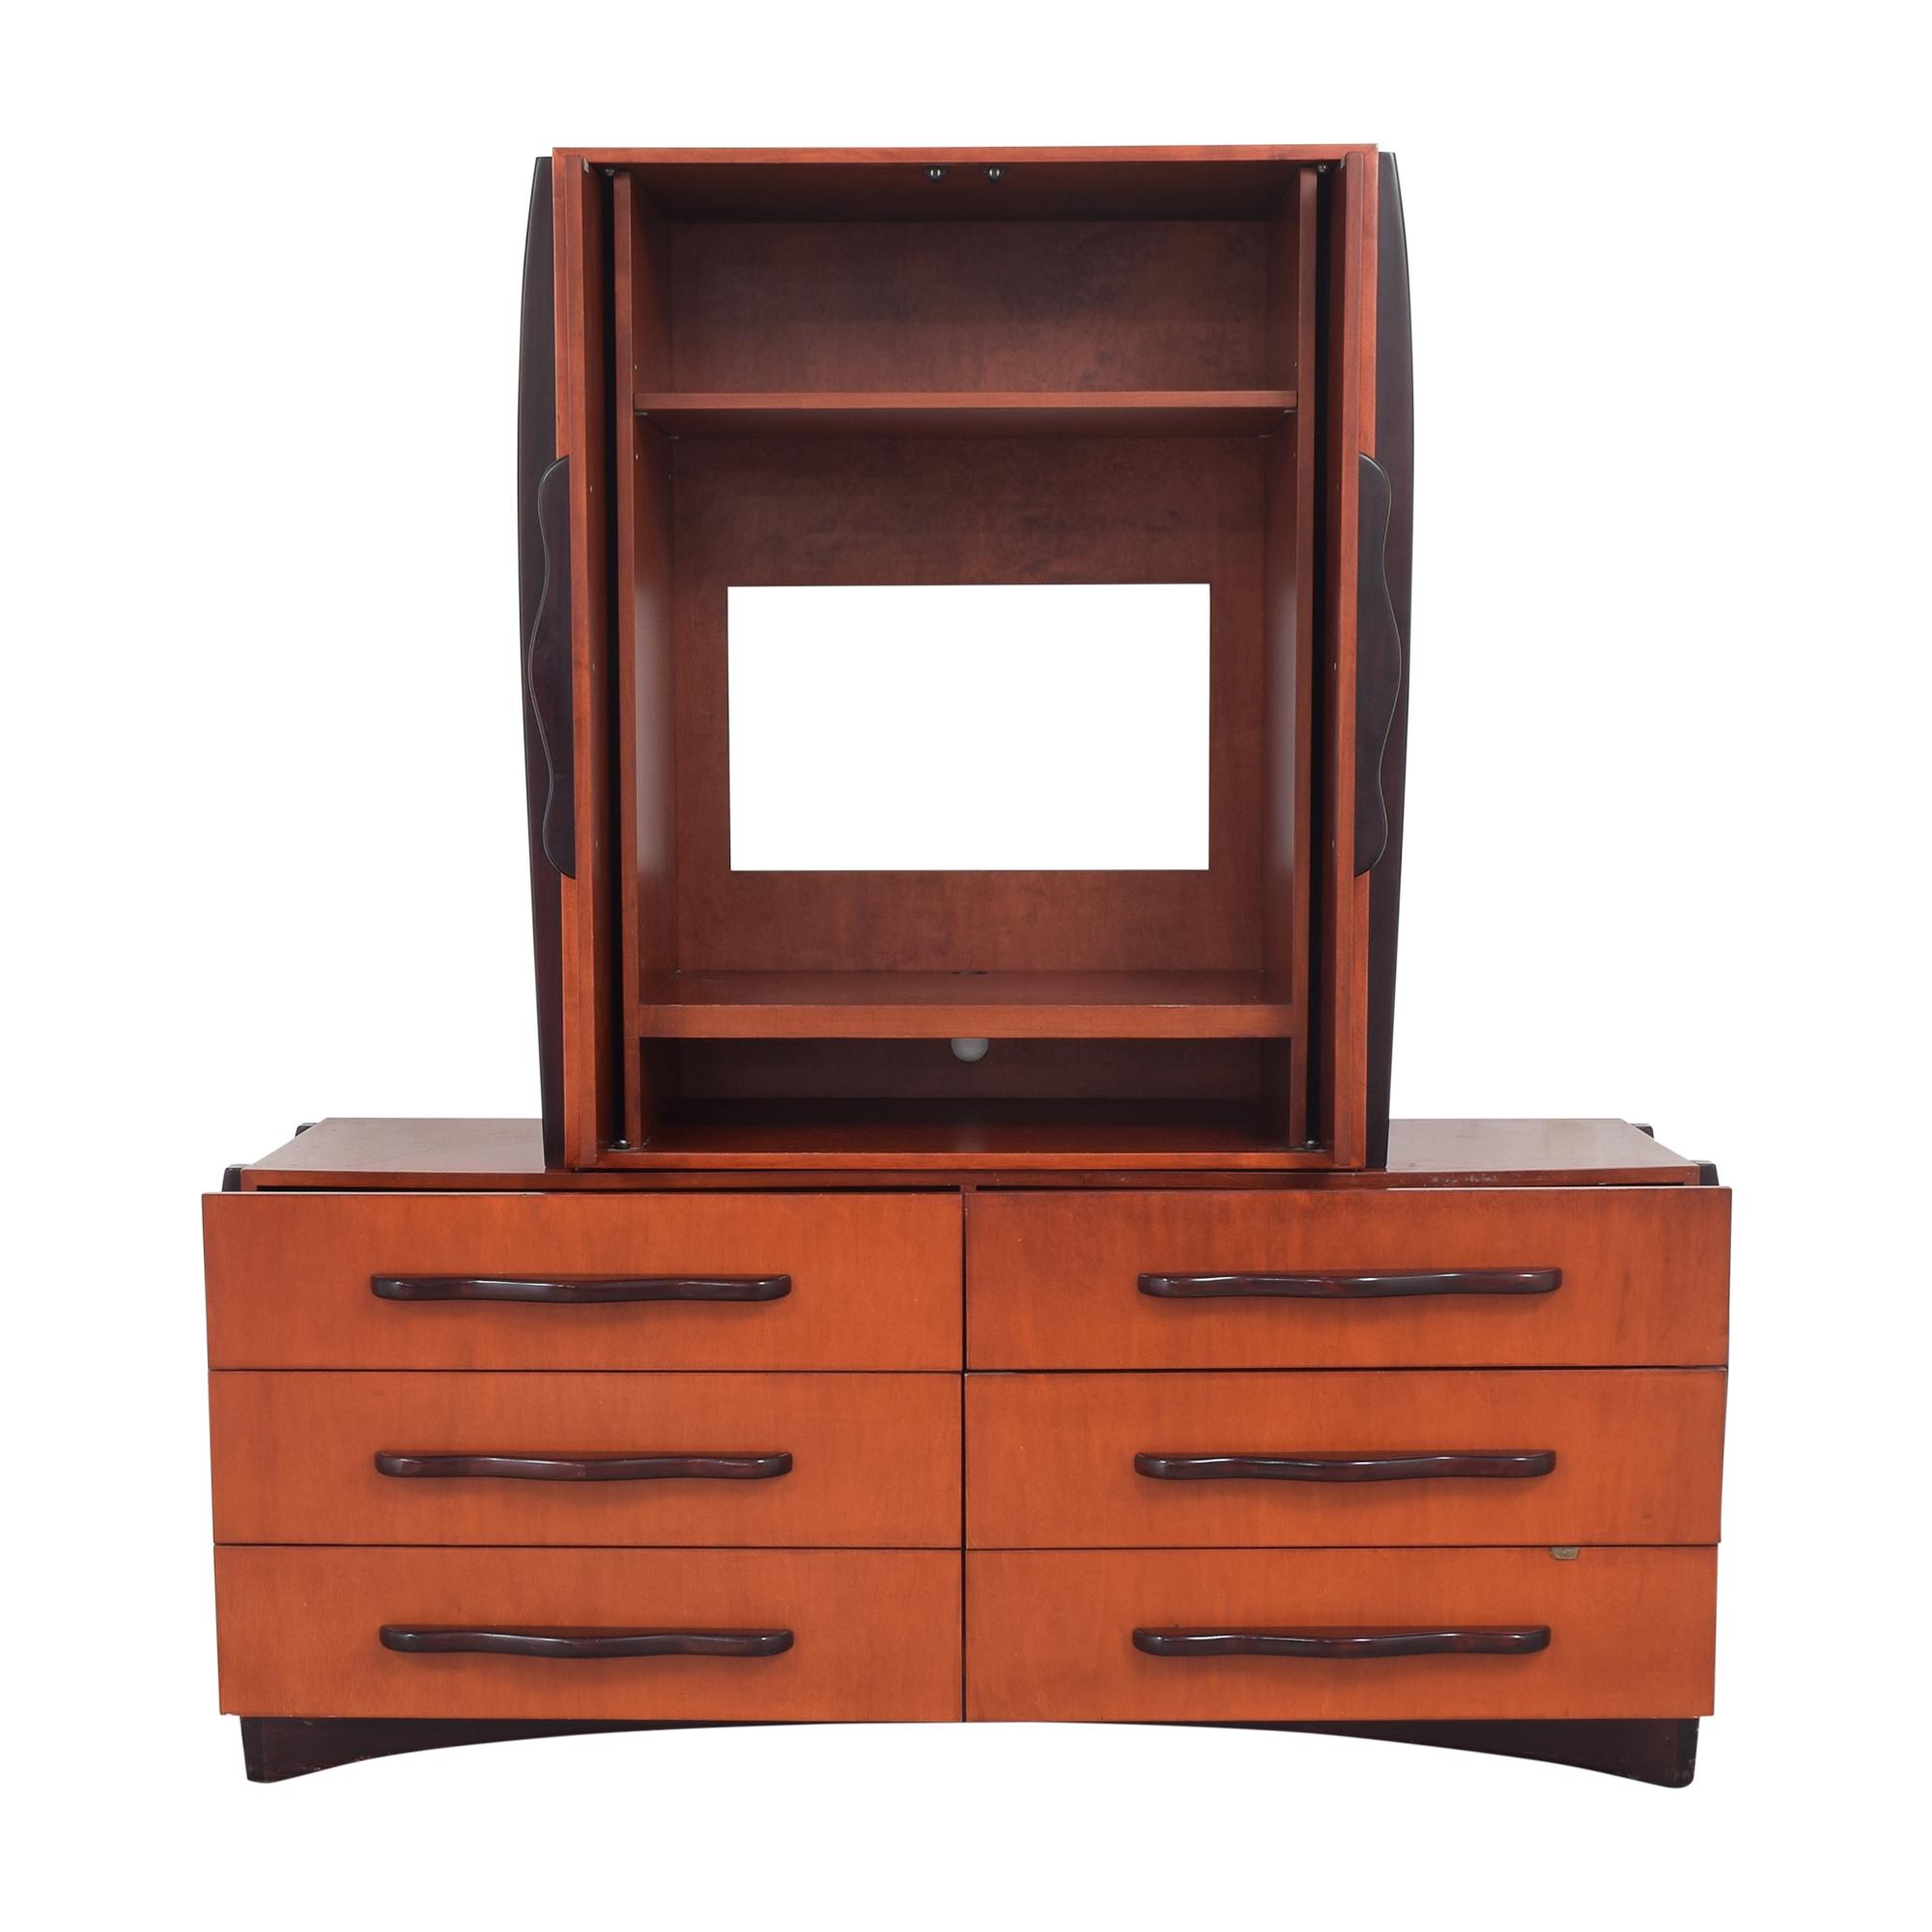 Dialogica Dialogica Malindi Double Dresser with Media Cabinet  ma